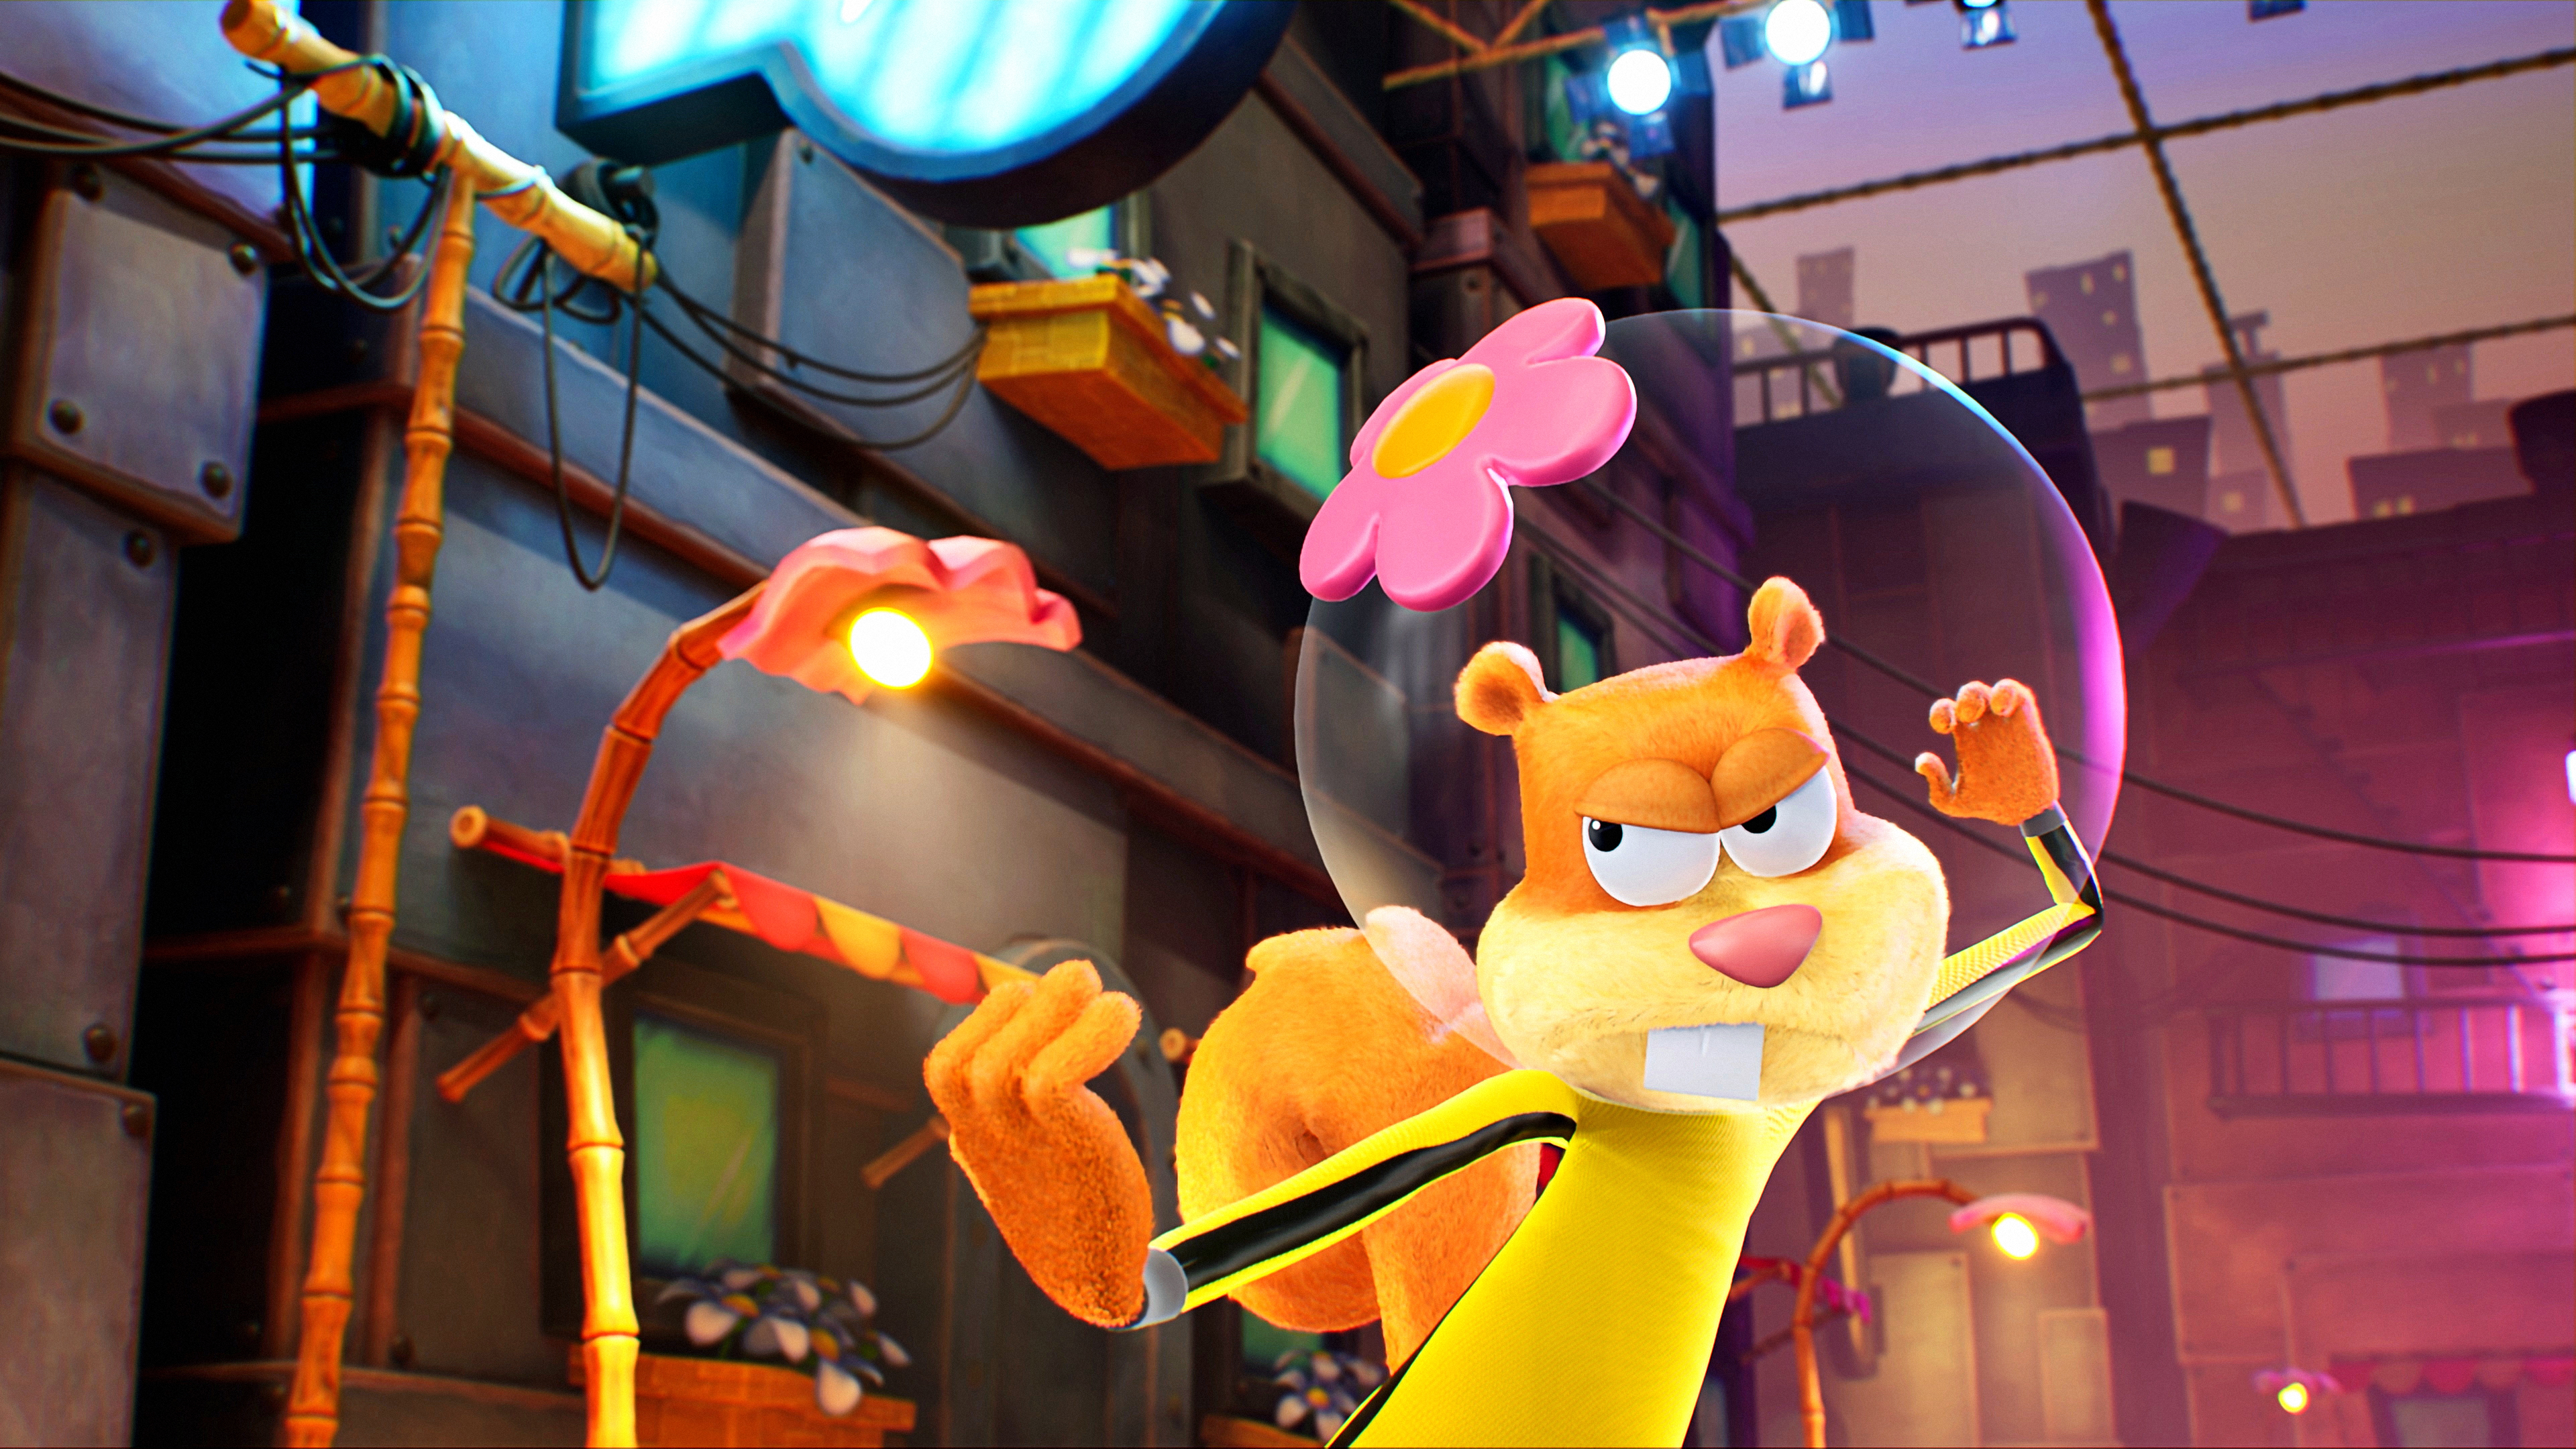 General 3840x2160 SpongeBob SquarePants: The Cosmic Shake SpongeBob SquarePants THQ Nordic Purple Lamp Studios Sandy Cheeks 4K video game art